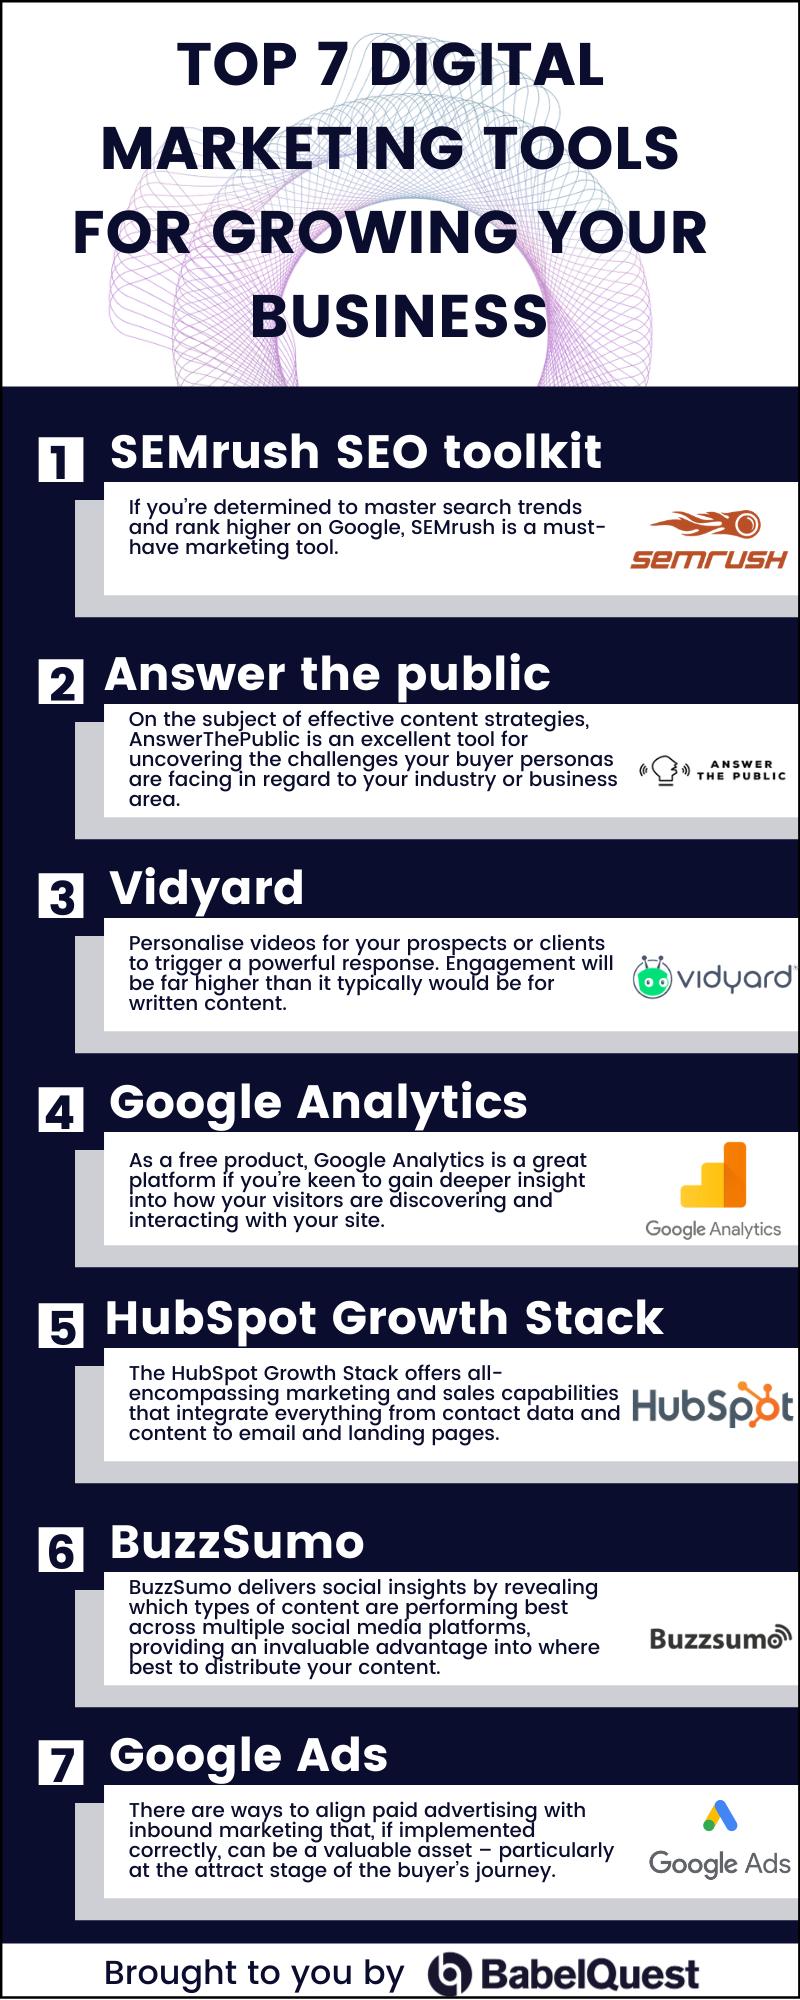 TOP 7 Digital Marketing Tools Infographic